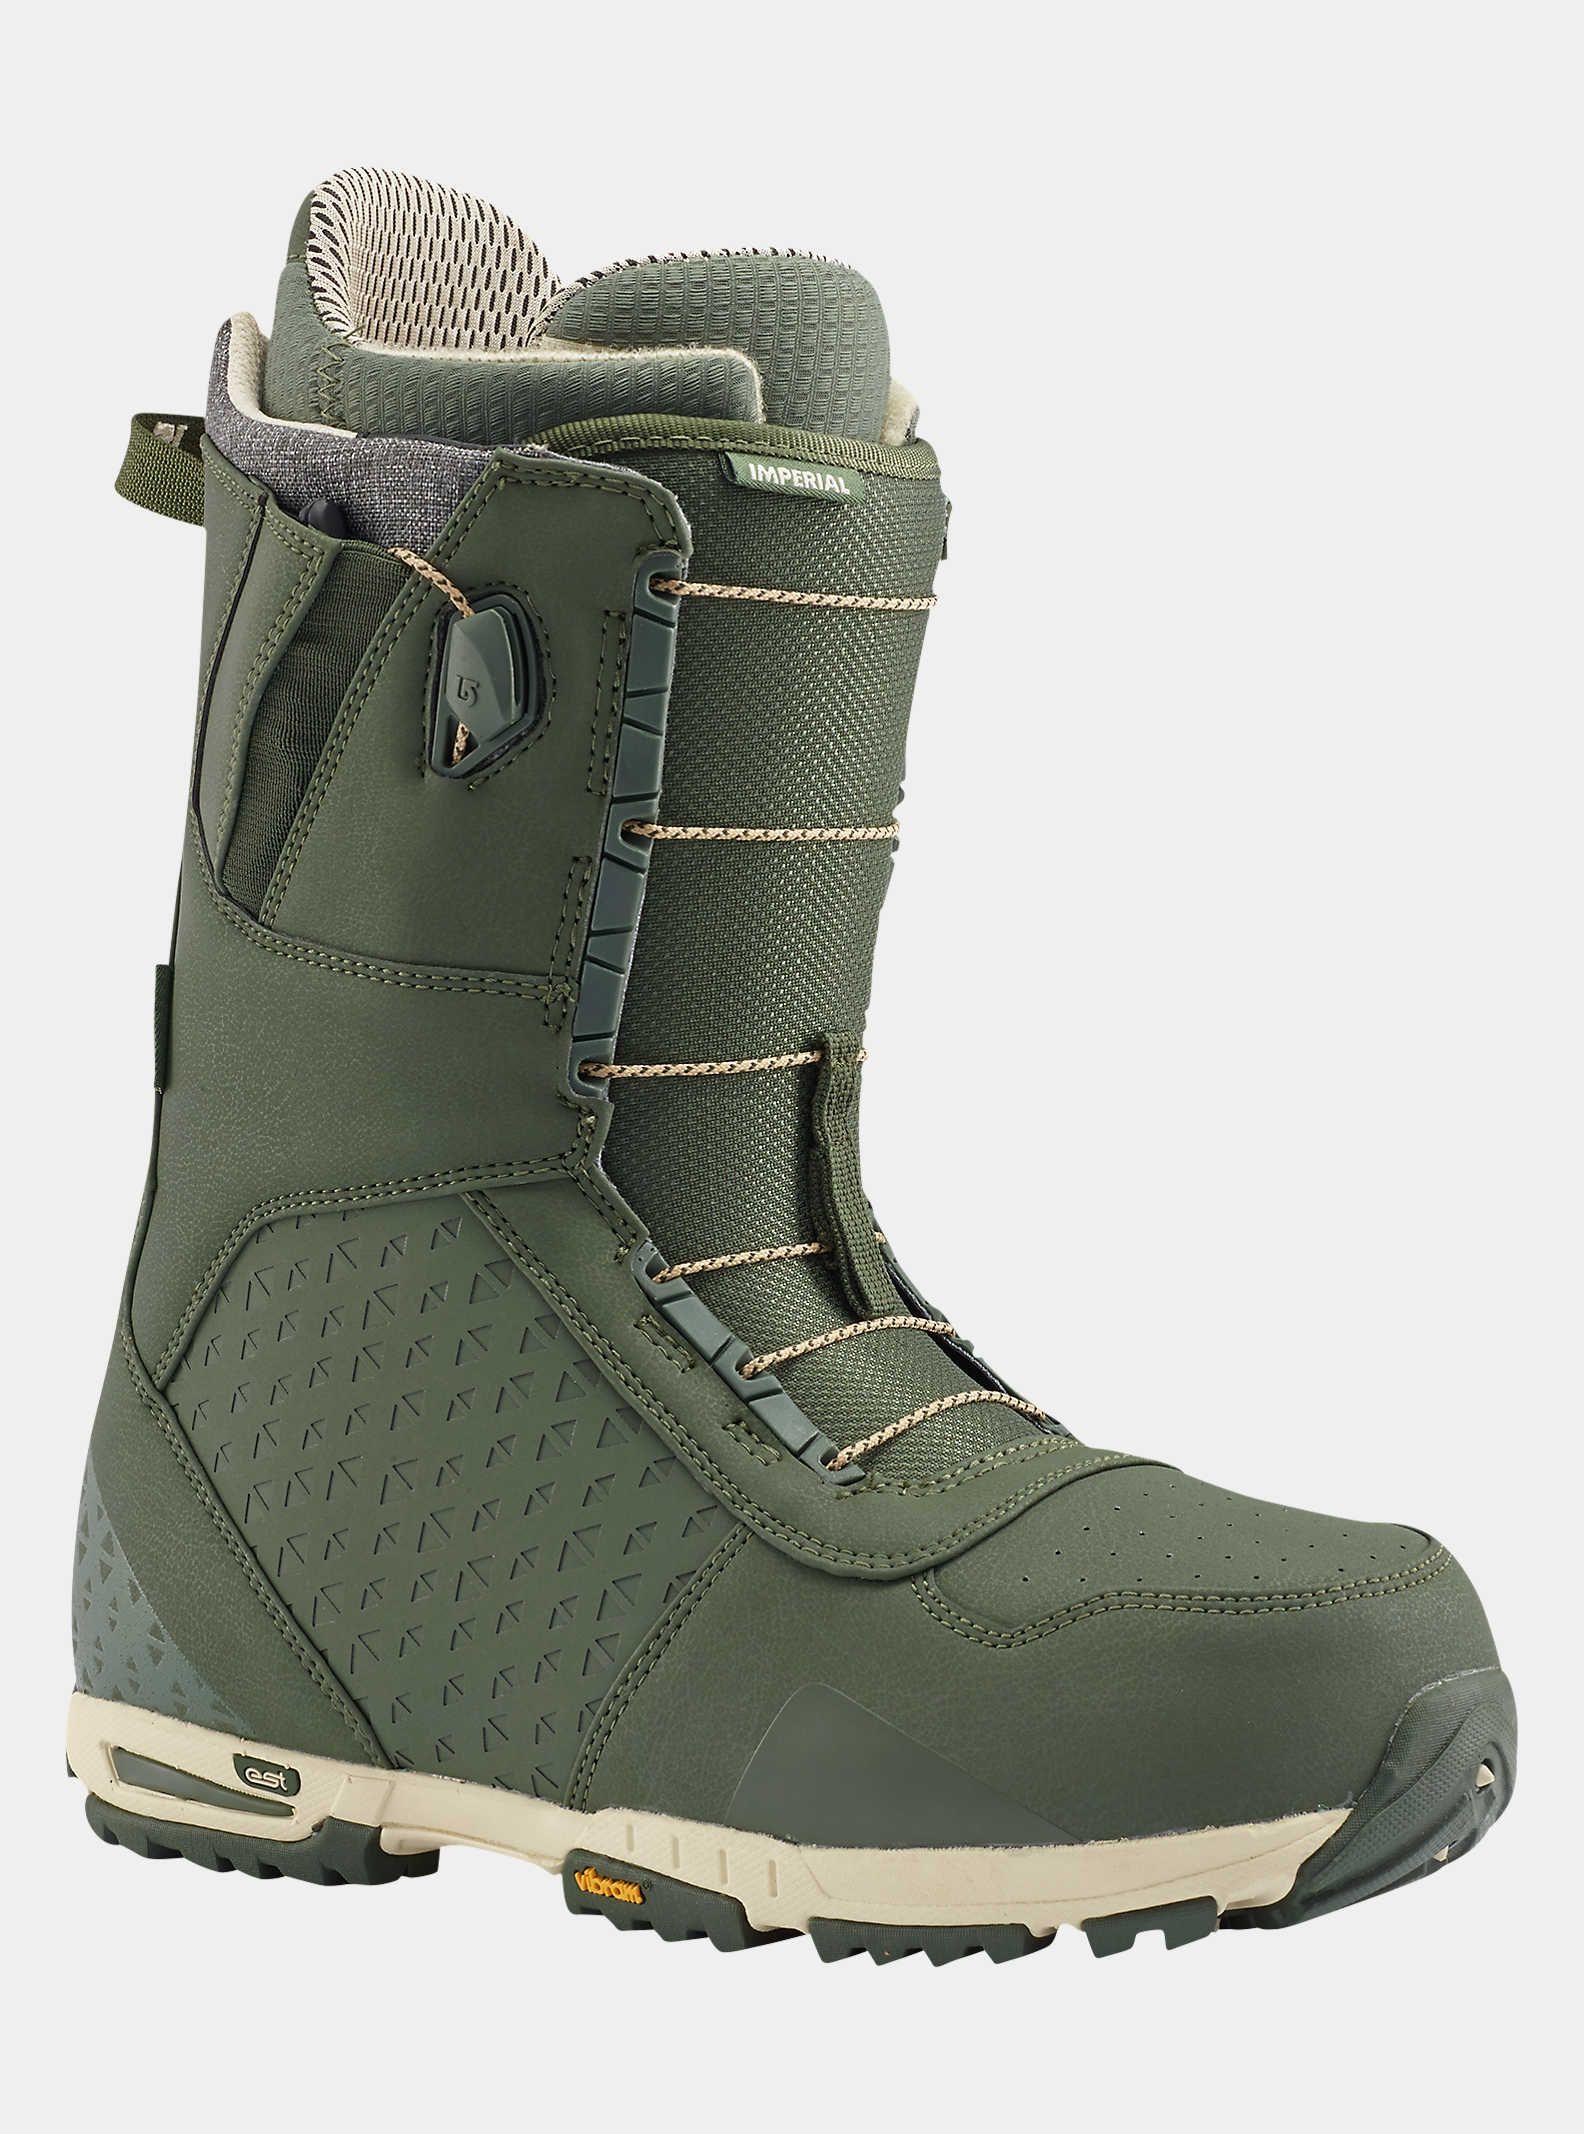 3c6f121fd1896 Burton Imperial Snowboard Boot